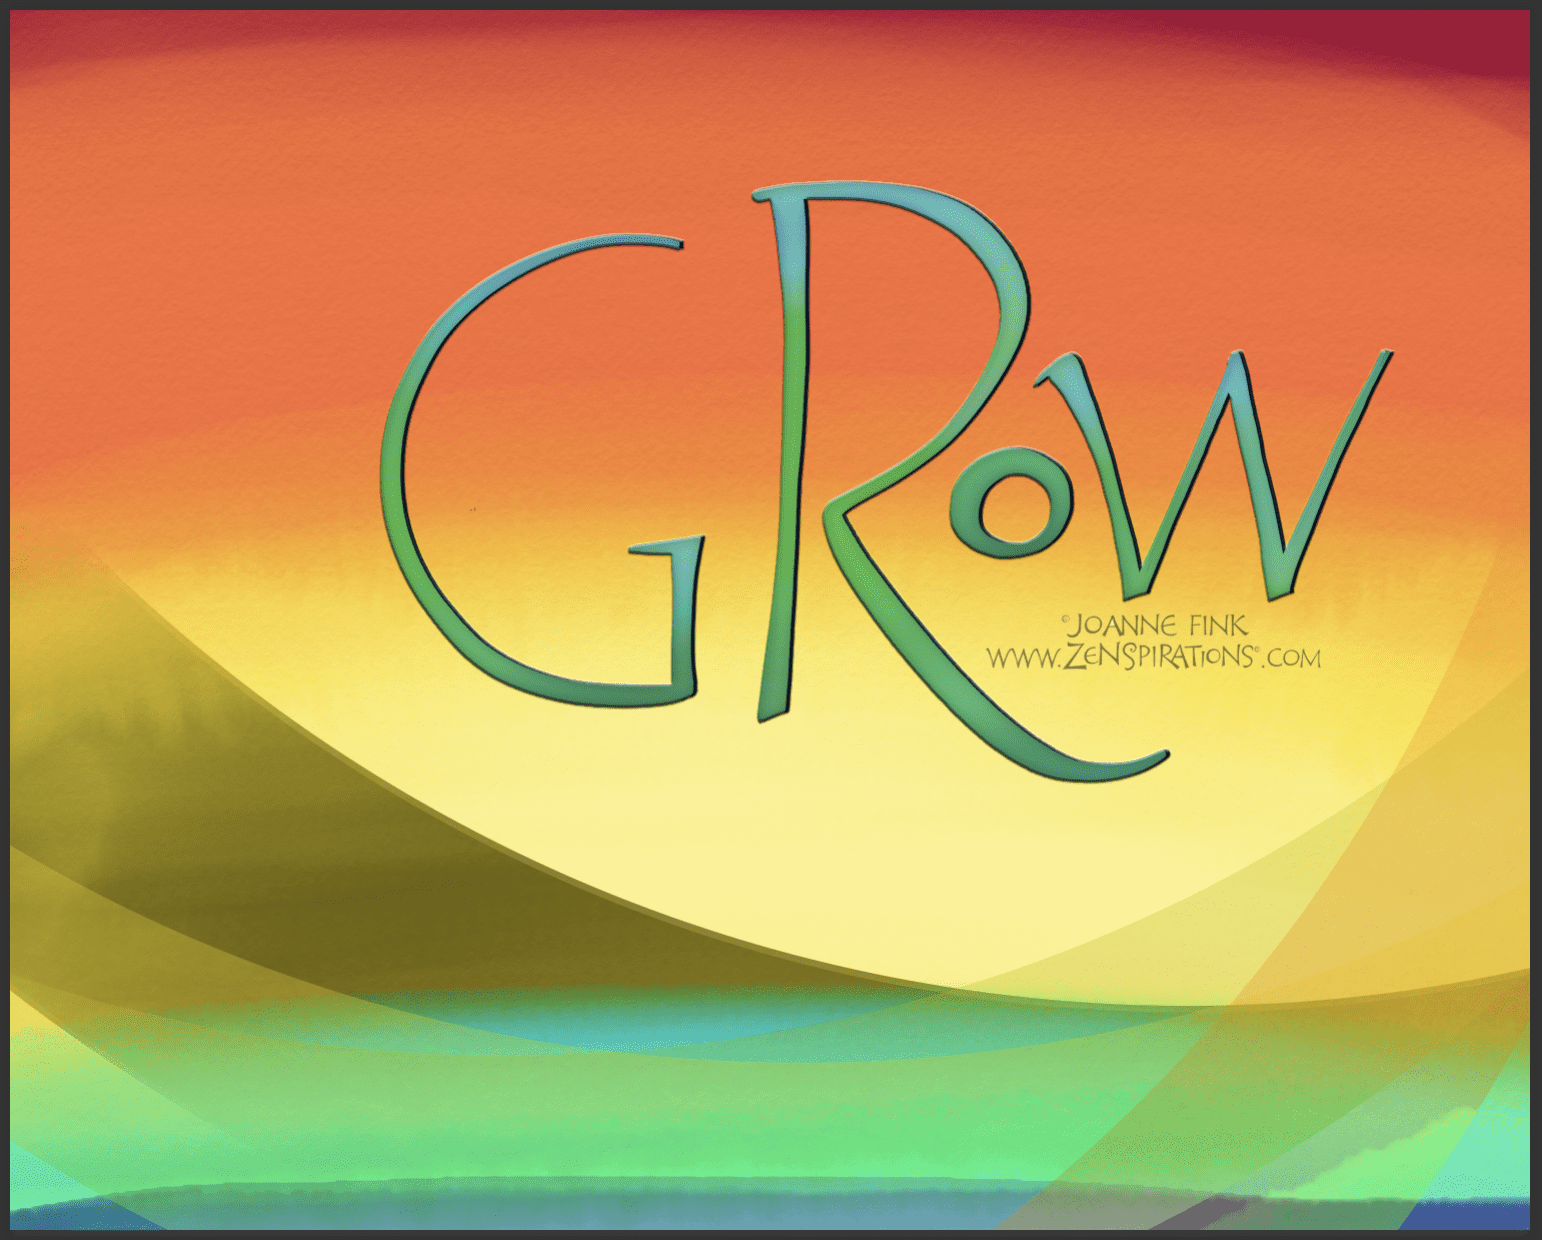 zenspirations_by_joanne_fink_new_year_blog_2016_grow